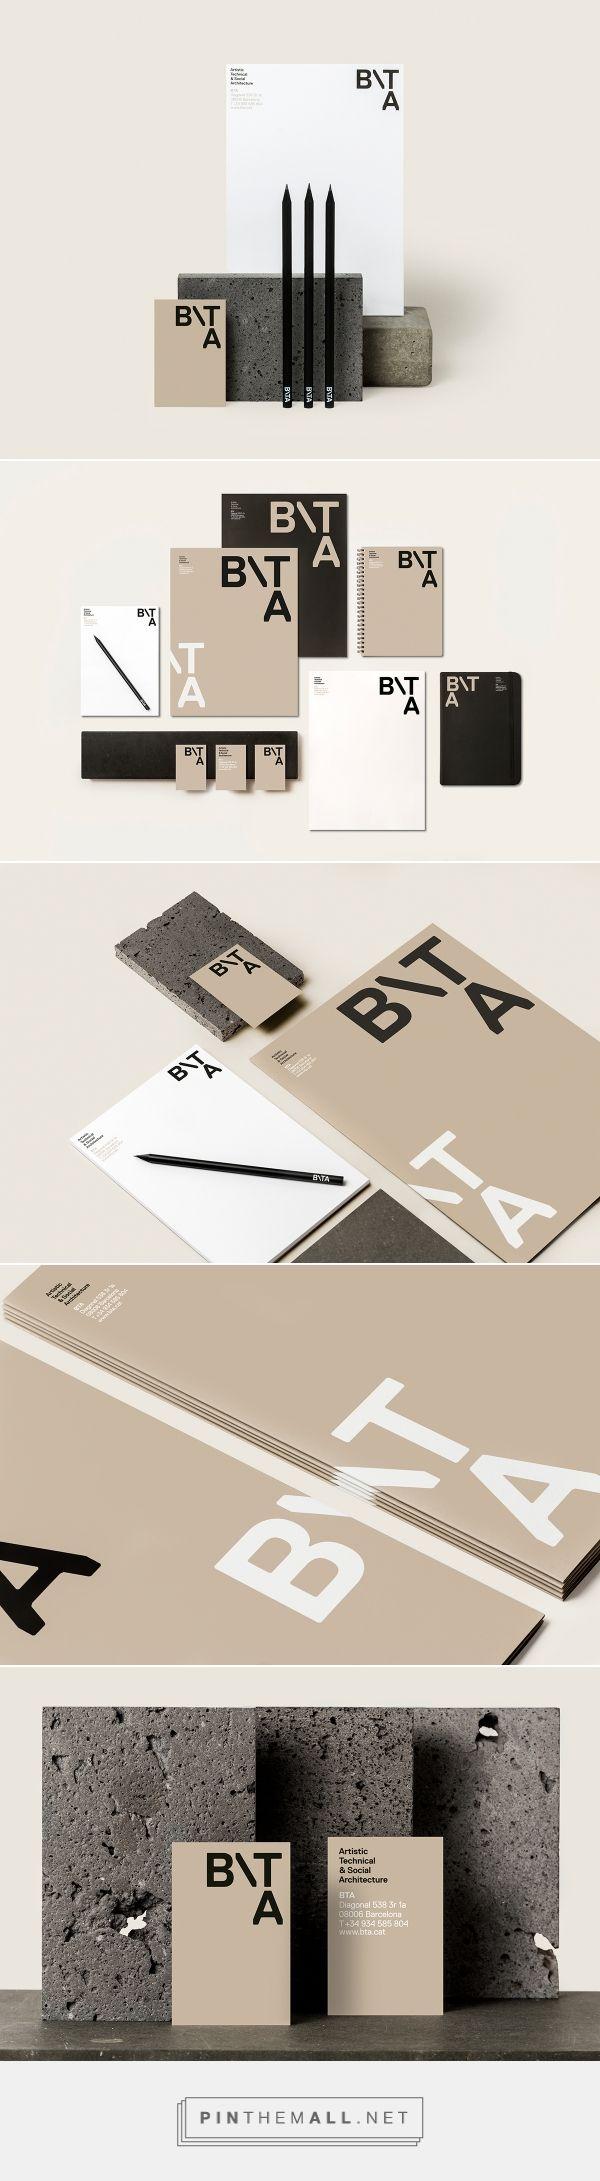 BTA - Architecture studio Branding by Griselda Marti   Fivestar Branding Agency – Design and Branding Agency & Curated Inspiration Gallery